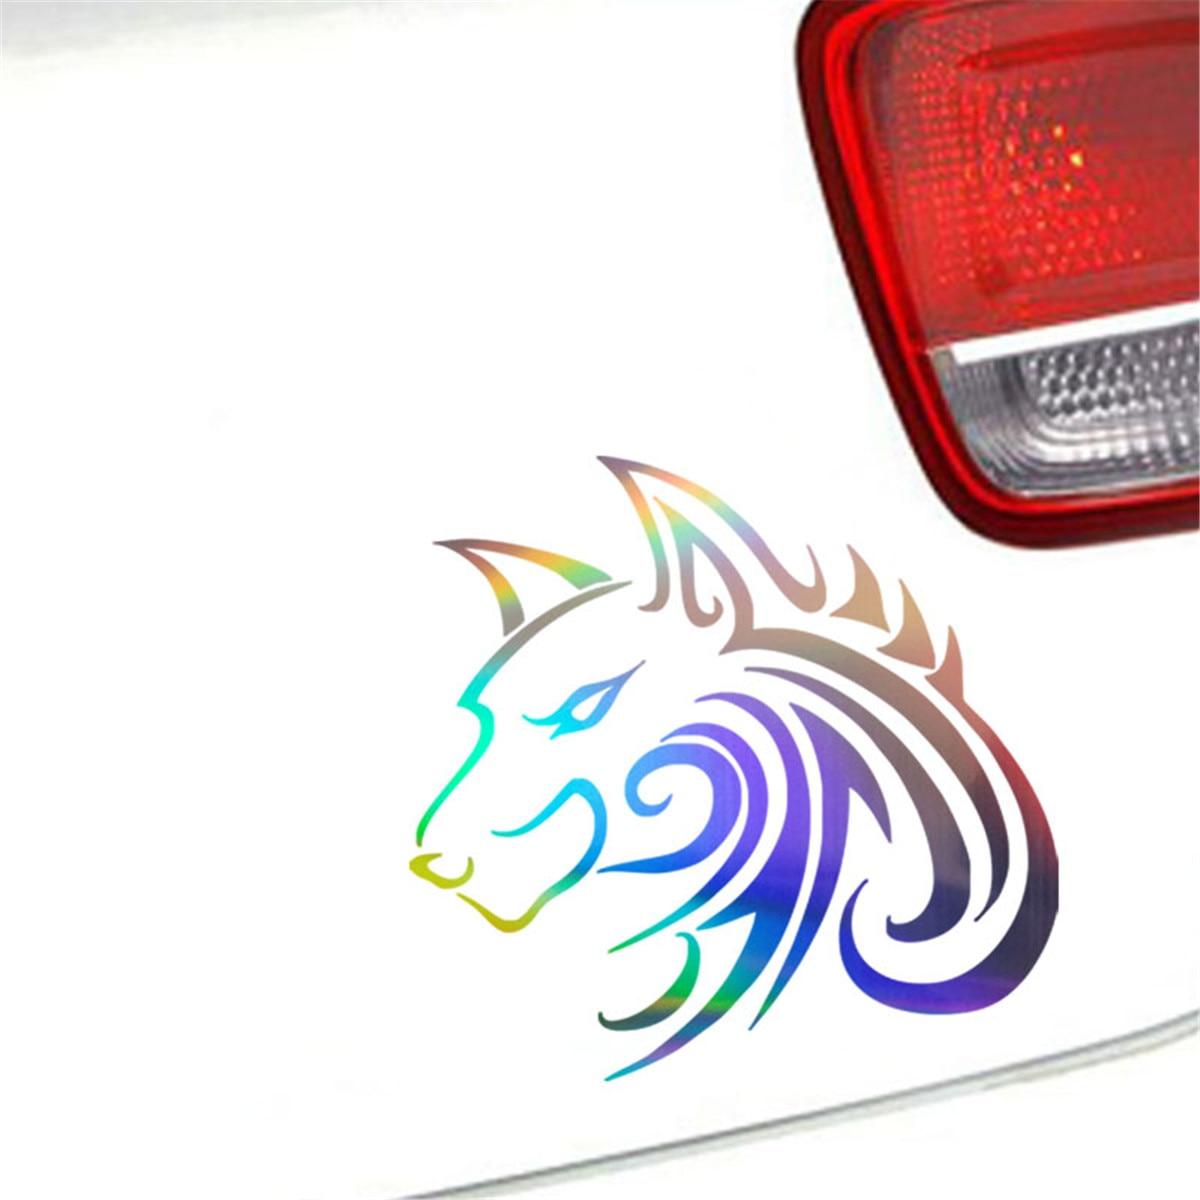 Abstract Peony/'s Flower Decal Sticker Car Truck Window Bumper Laptop Wall